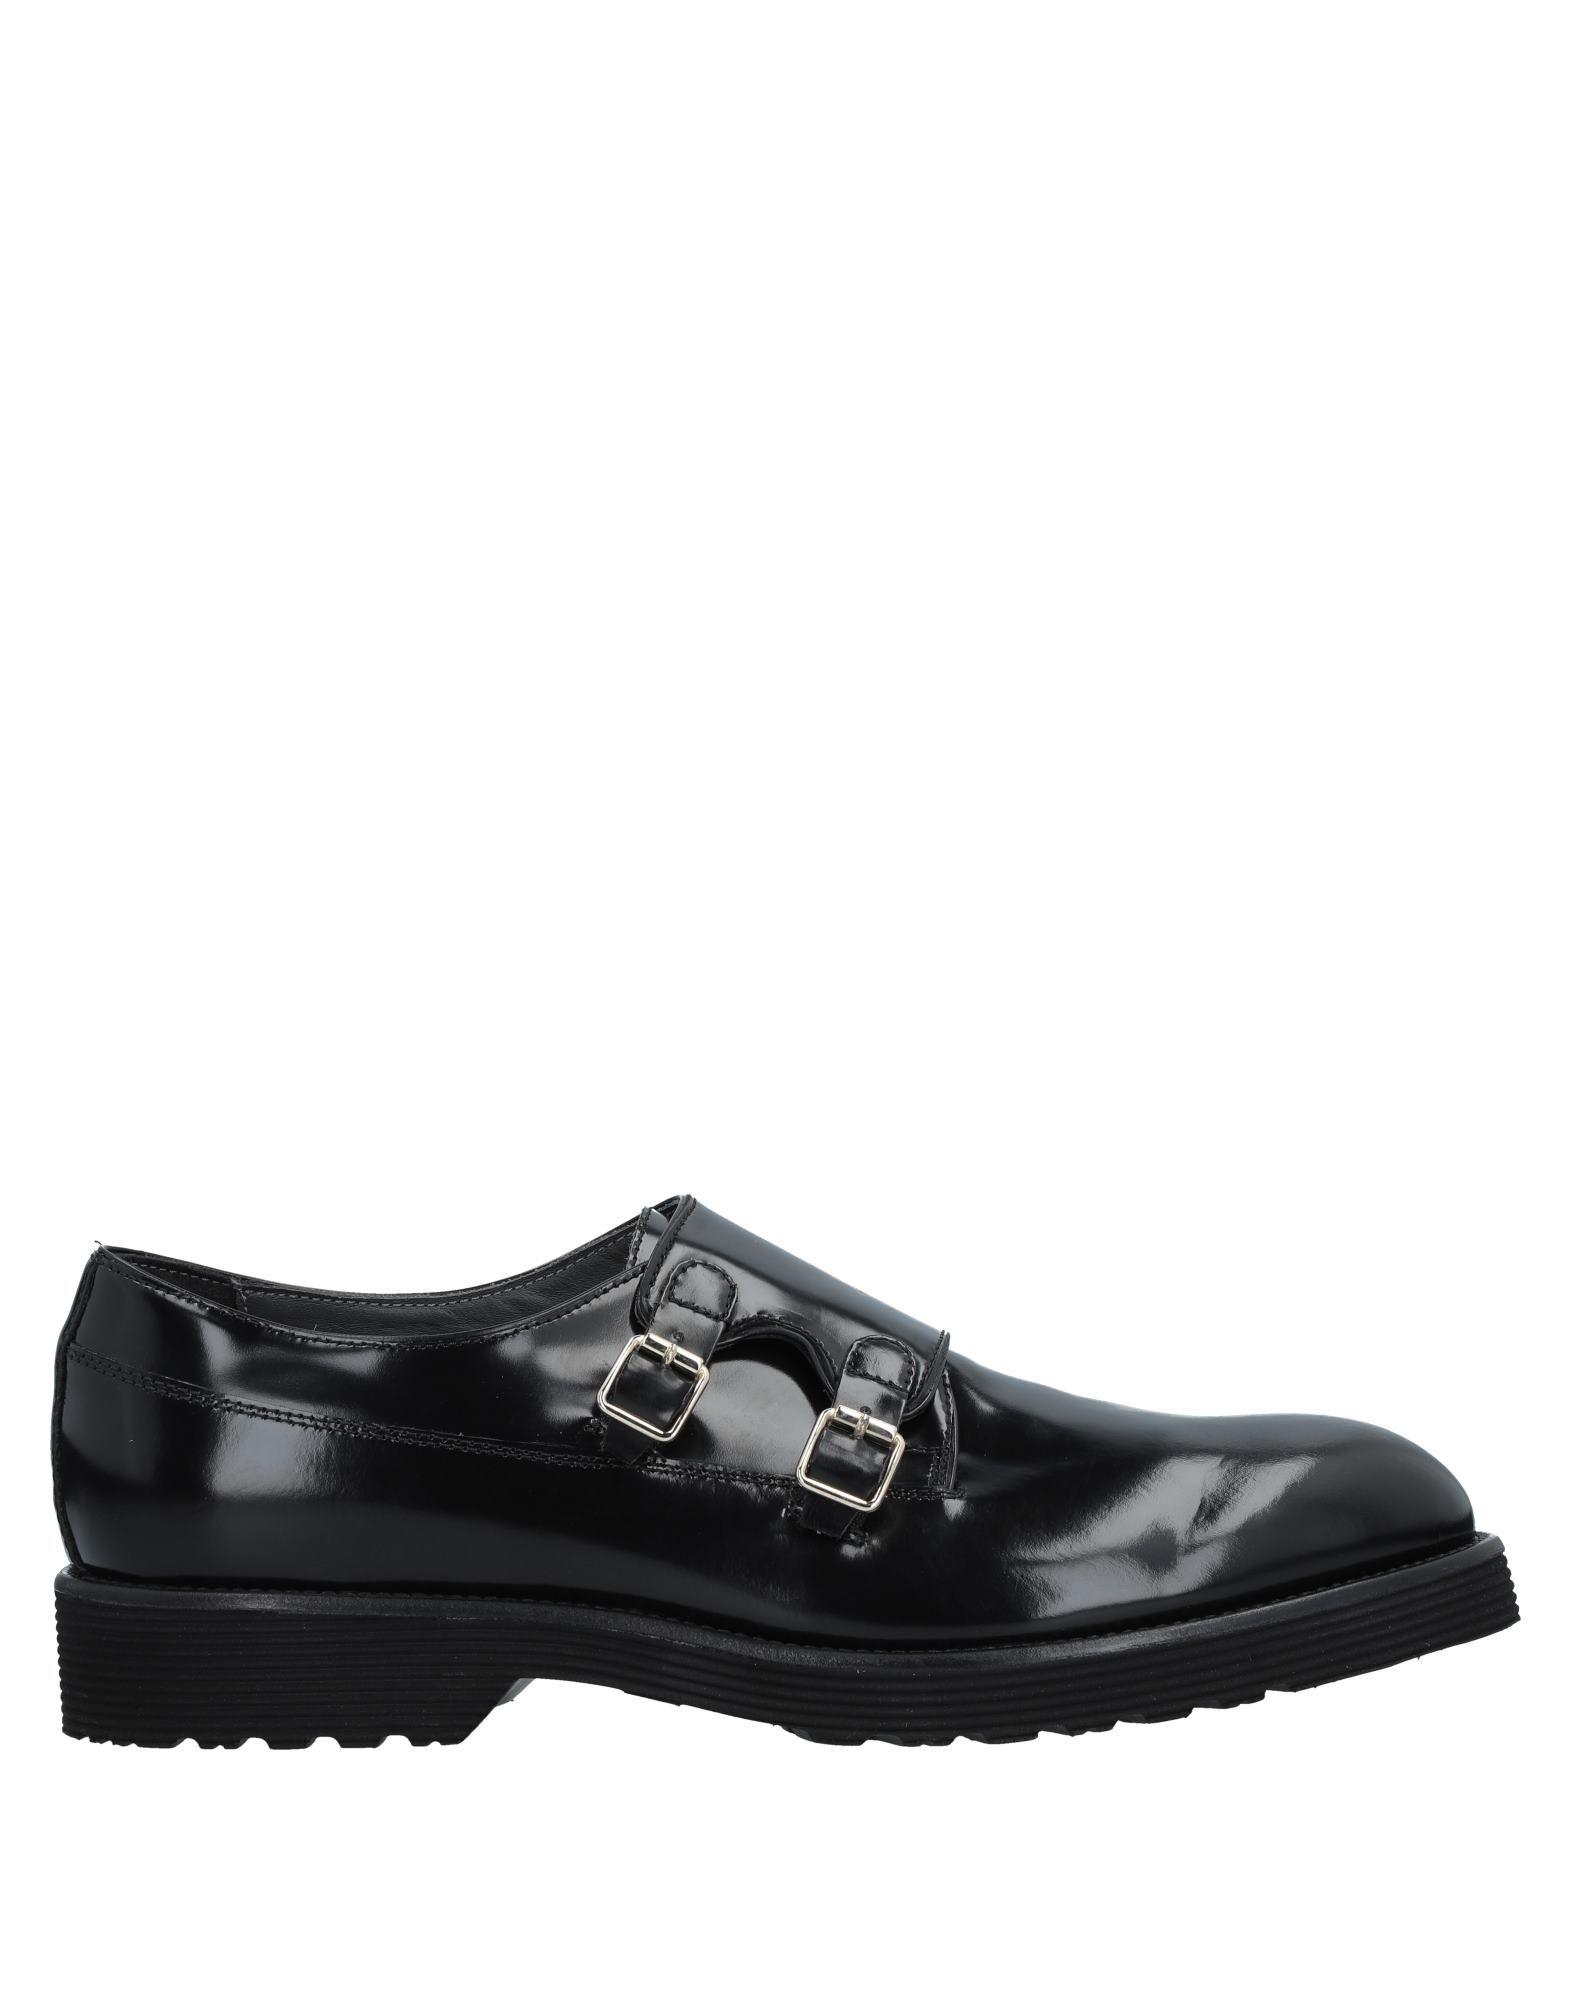 Alberto Guardiani Mokassins Herren  11533507CJ Gute Qualität beliebte Schuhe